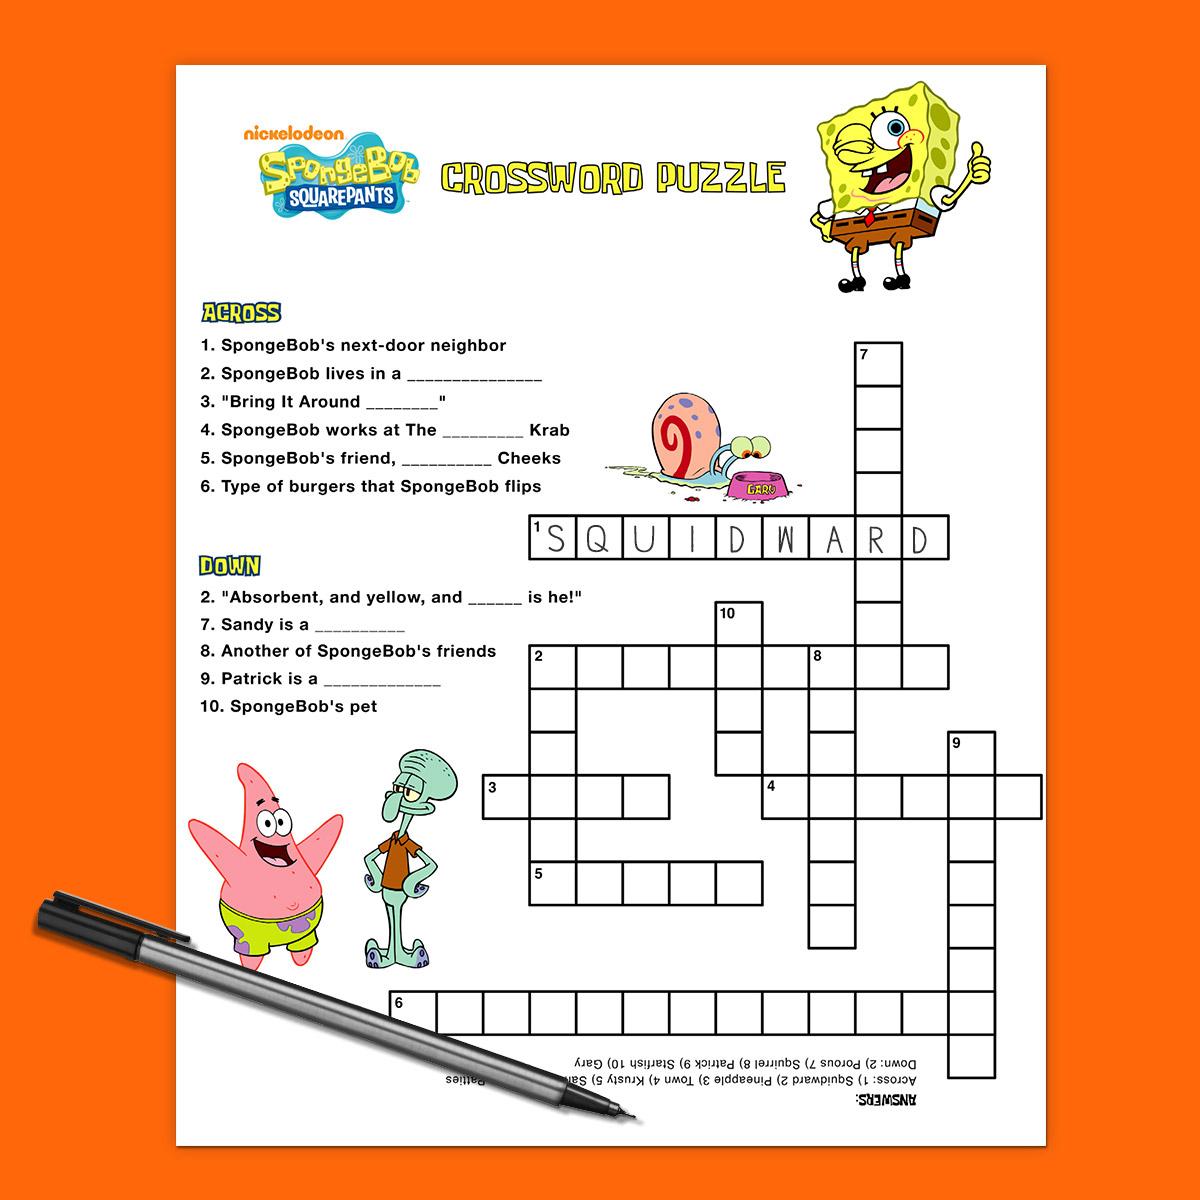 Spongebob Crossword Puzzle | Nickelodeon Parents - Printable Birthday Crossword Puzzles